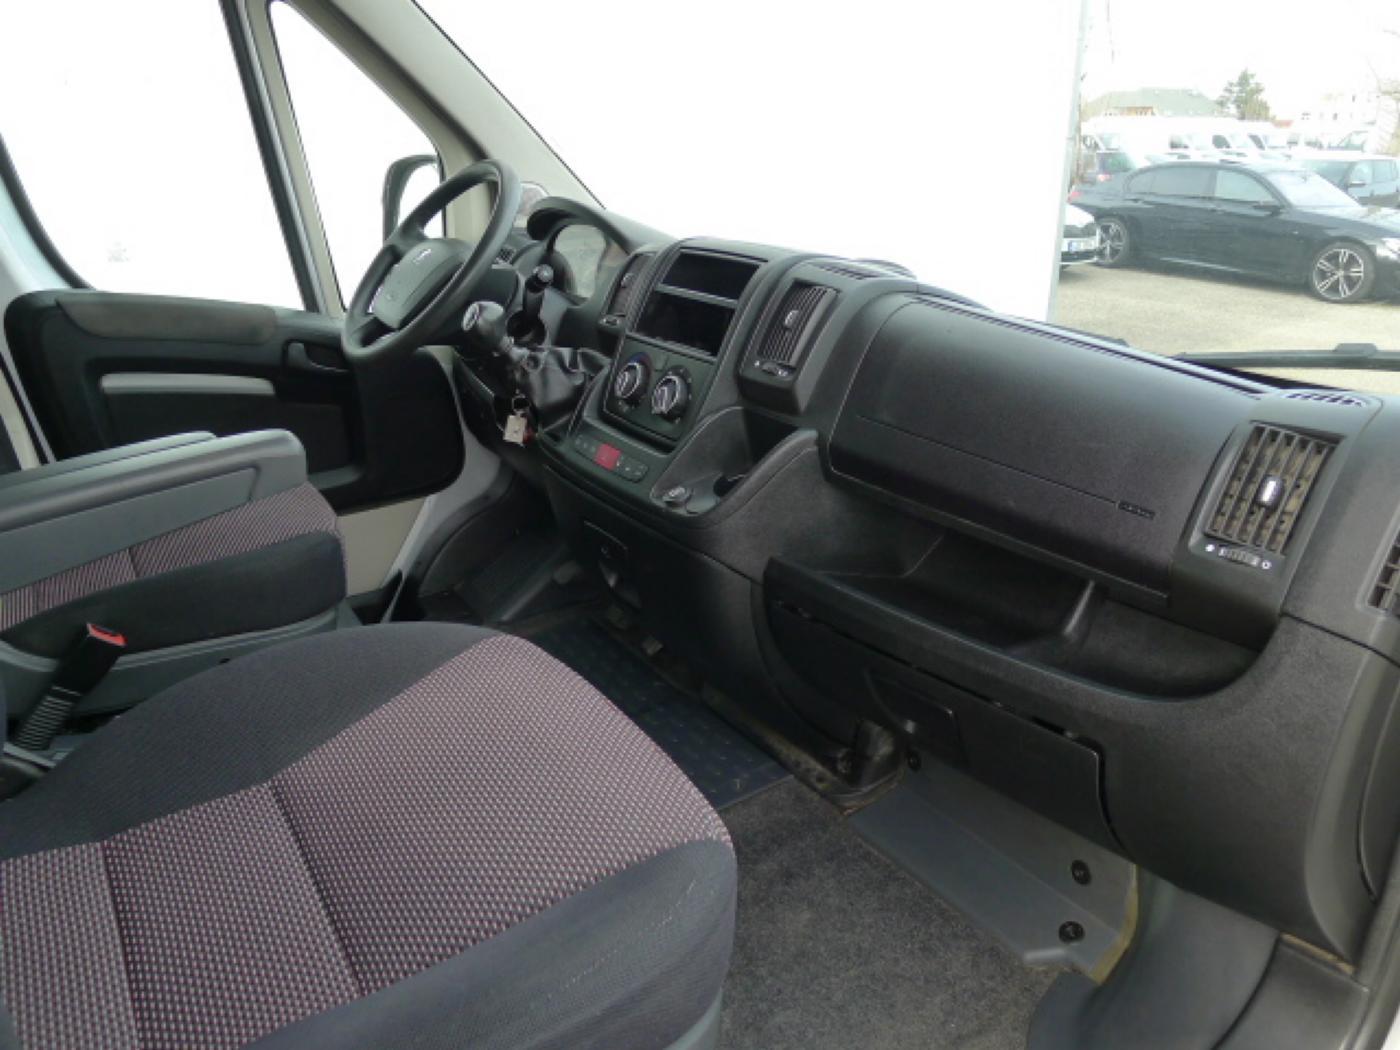 Peugeot Boxer 2,2 HDI PANORAMA 8míst+2 x klima+We - 10